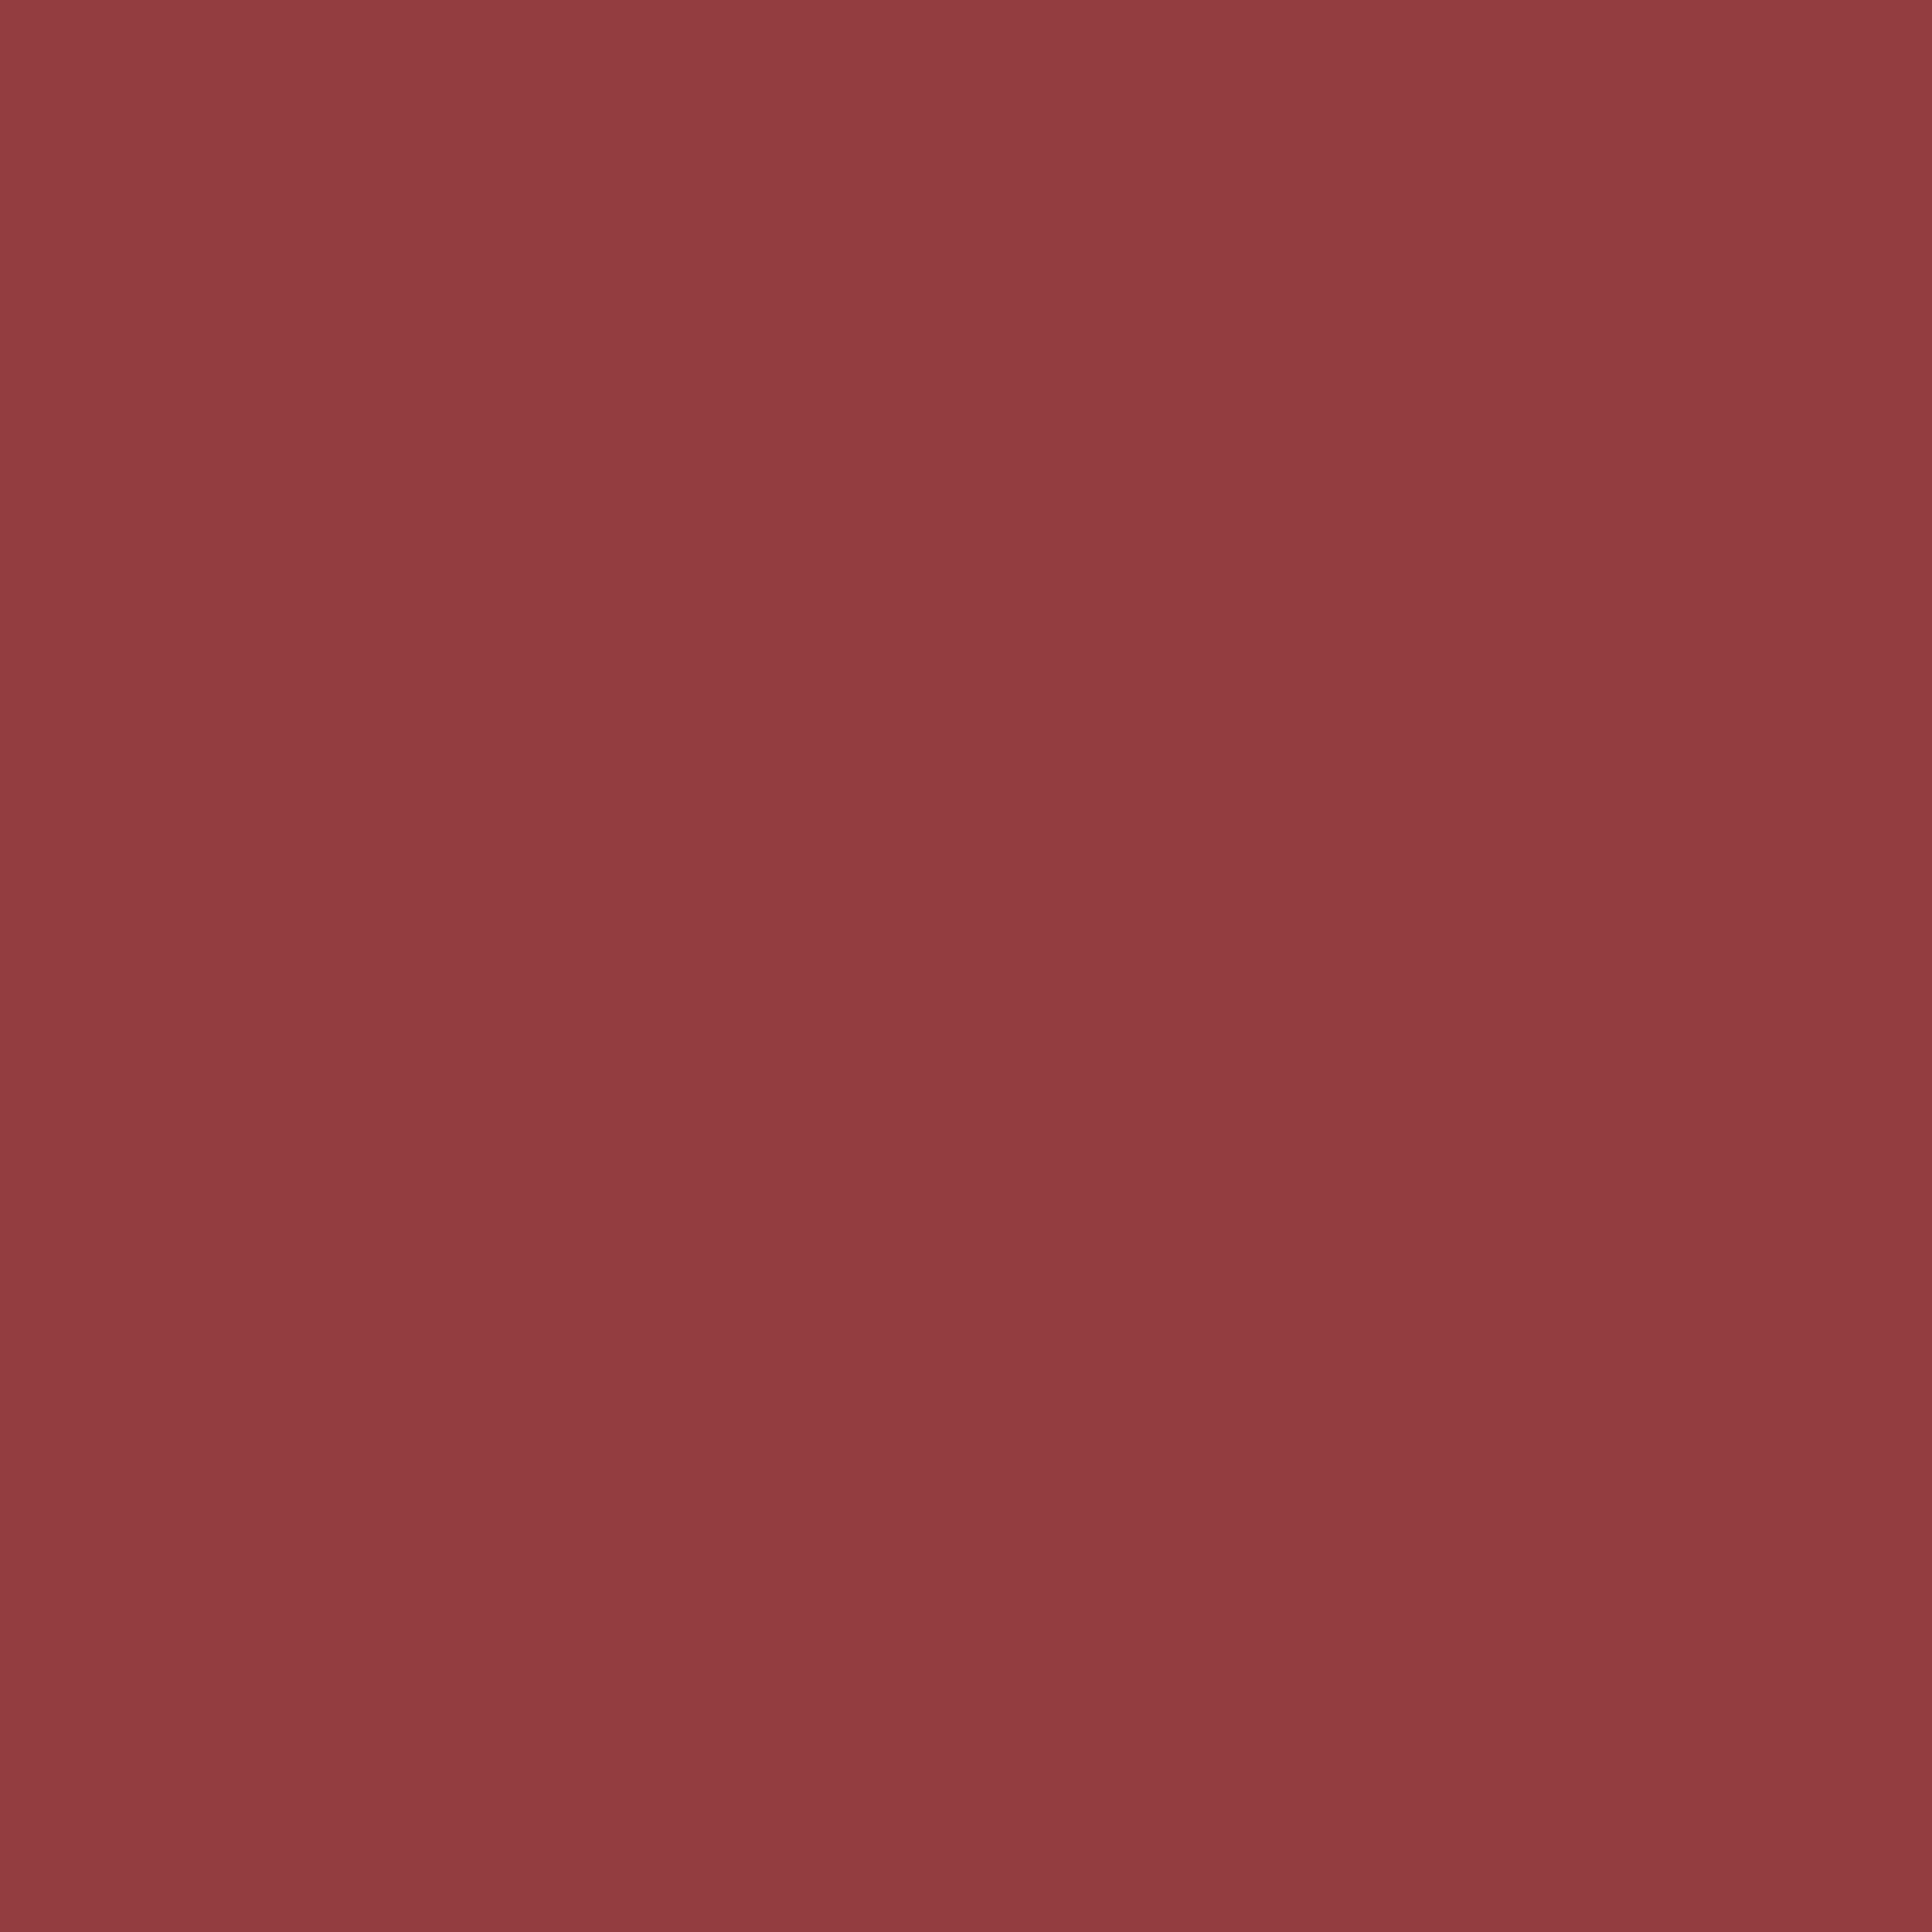 3600x3600 Smokey Topaz Solid Color Background